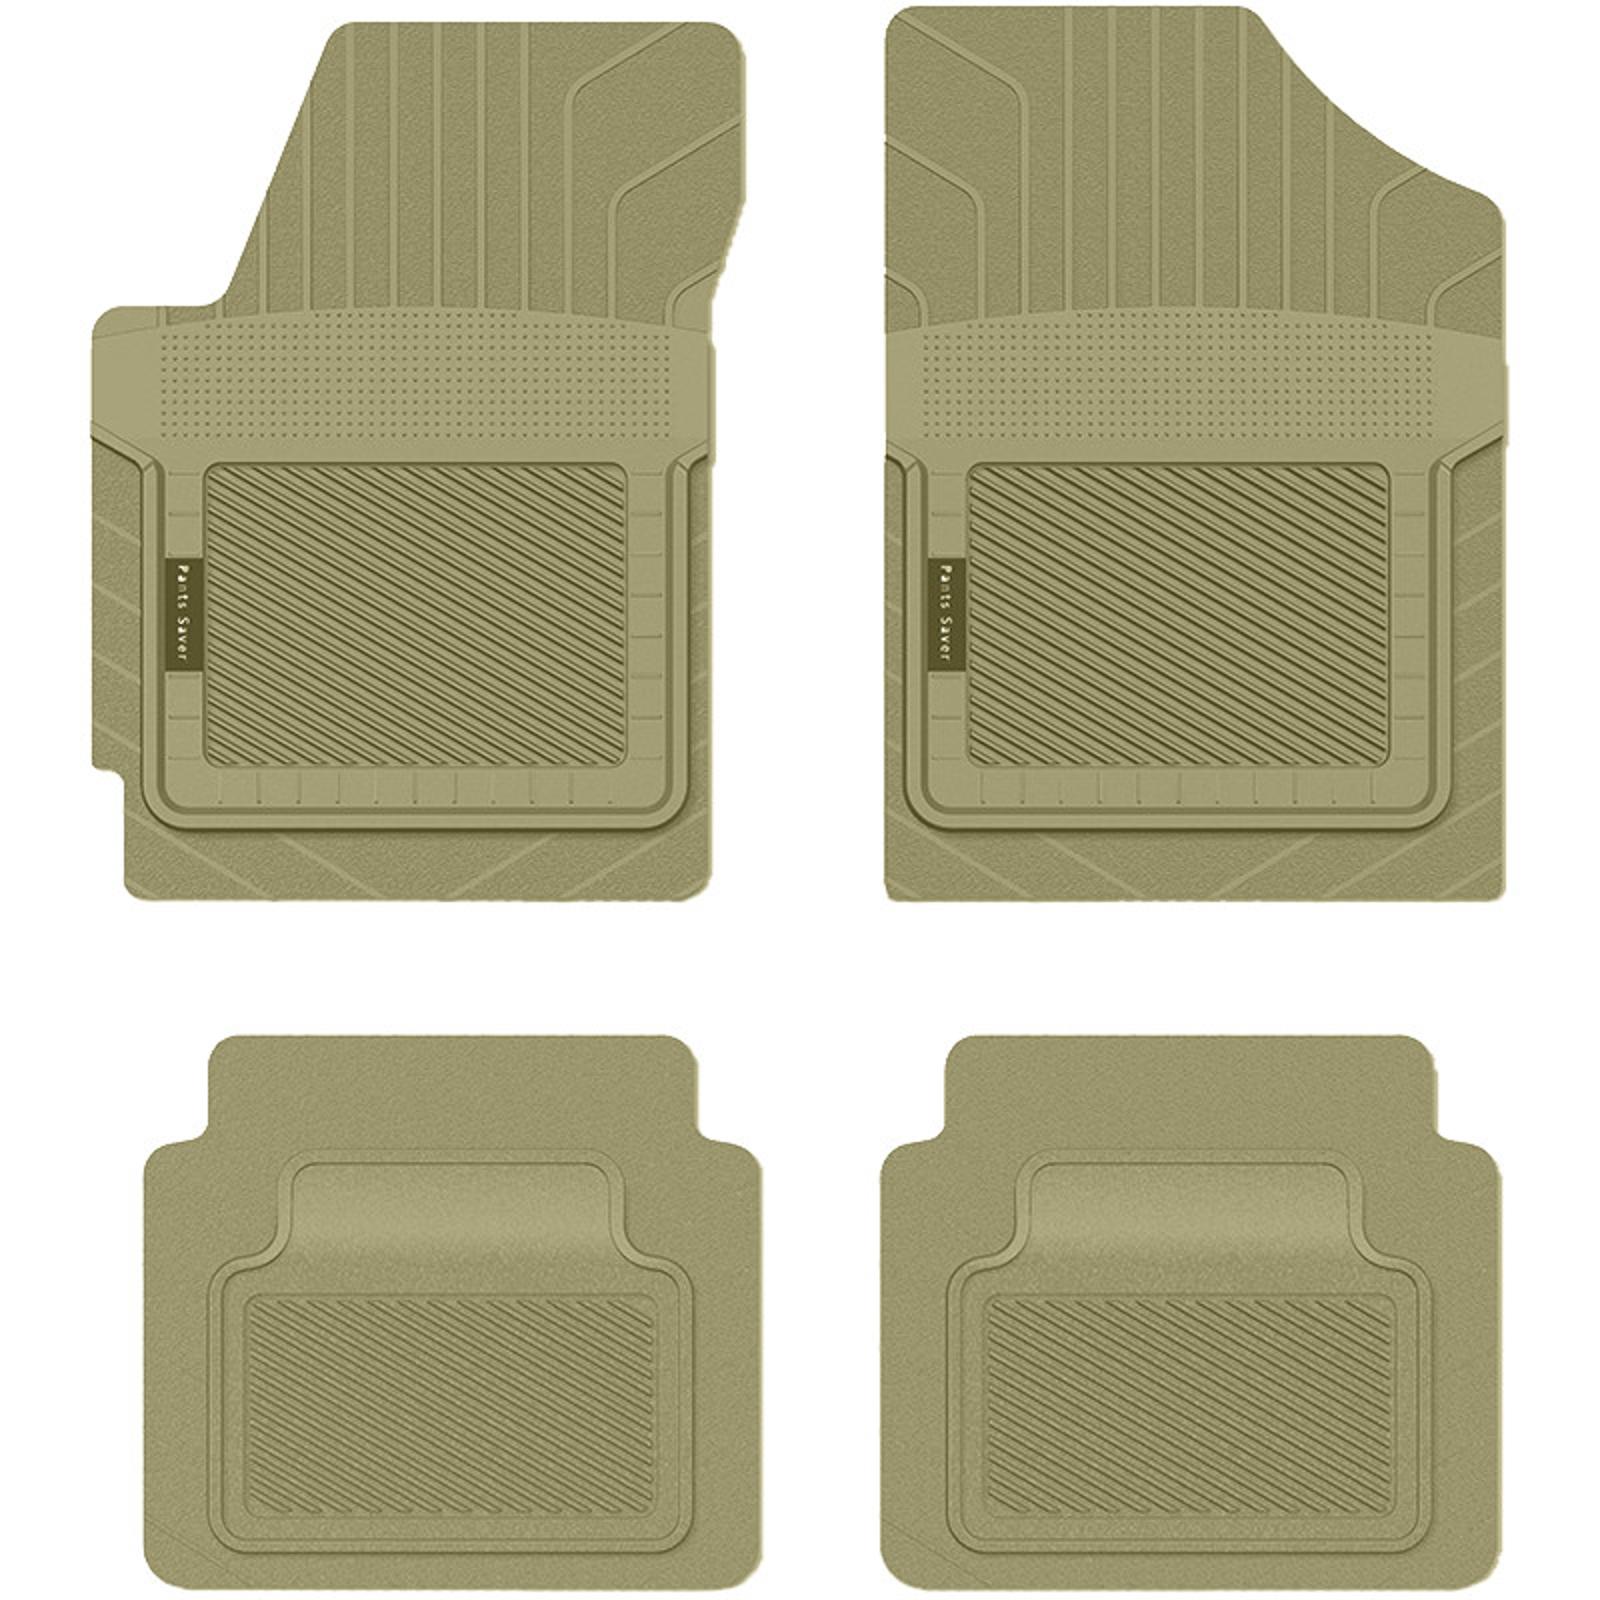 Koolatron Pants Saver Custom Fit Car Mat 4PC GMC YUKON XL 2010 Black PartNumber: 02839528000P KsnValue: 02839528000 MfgPartNumber: 1113101